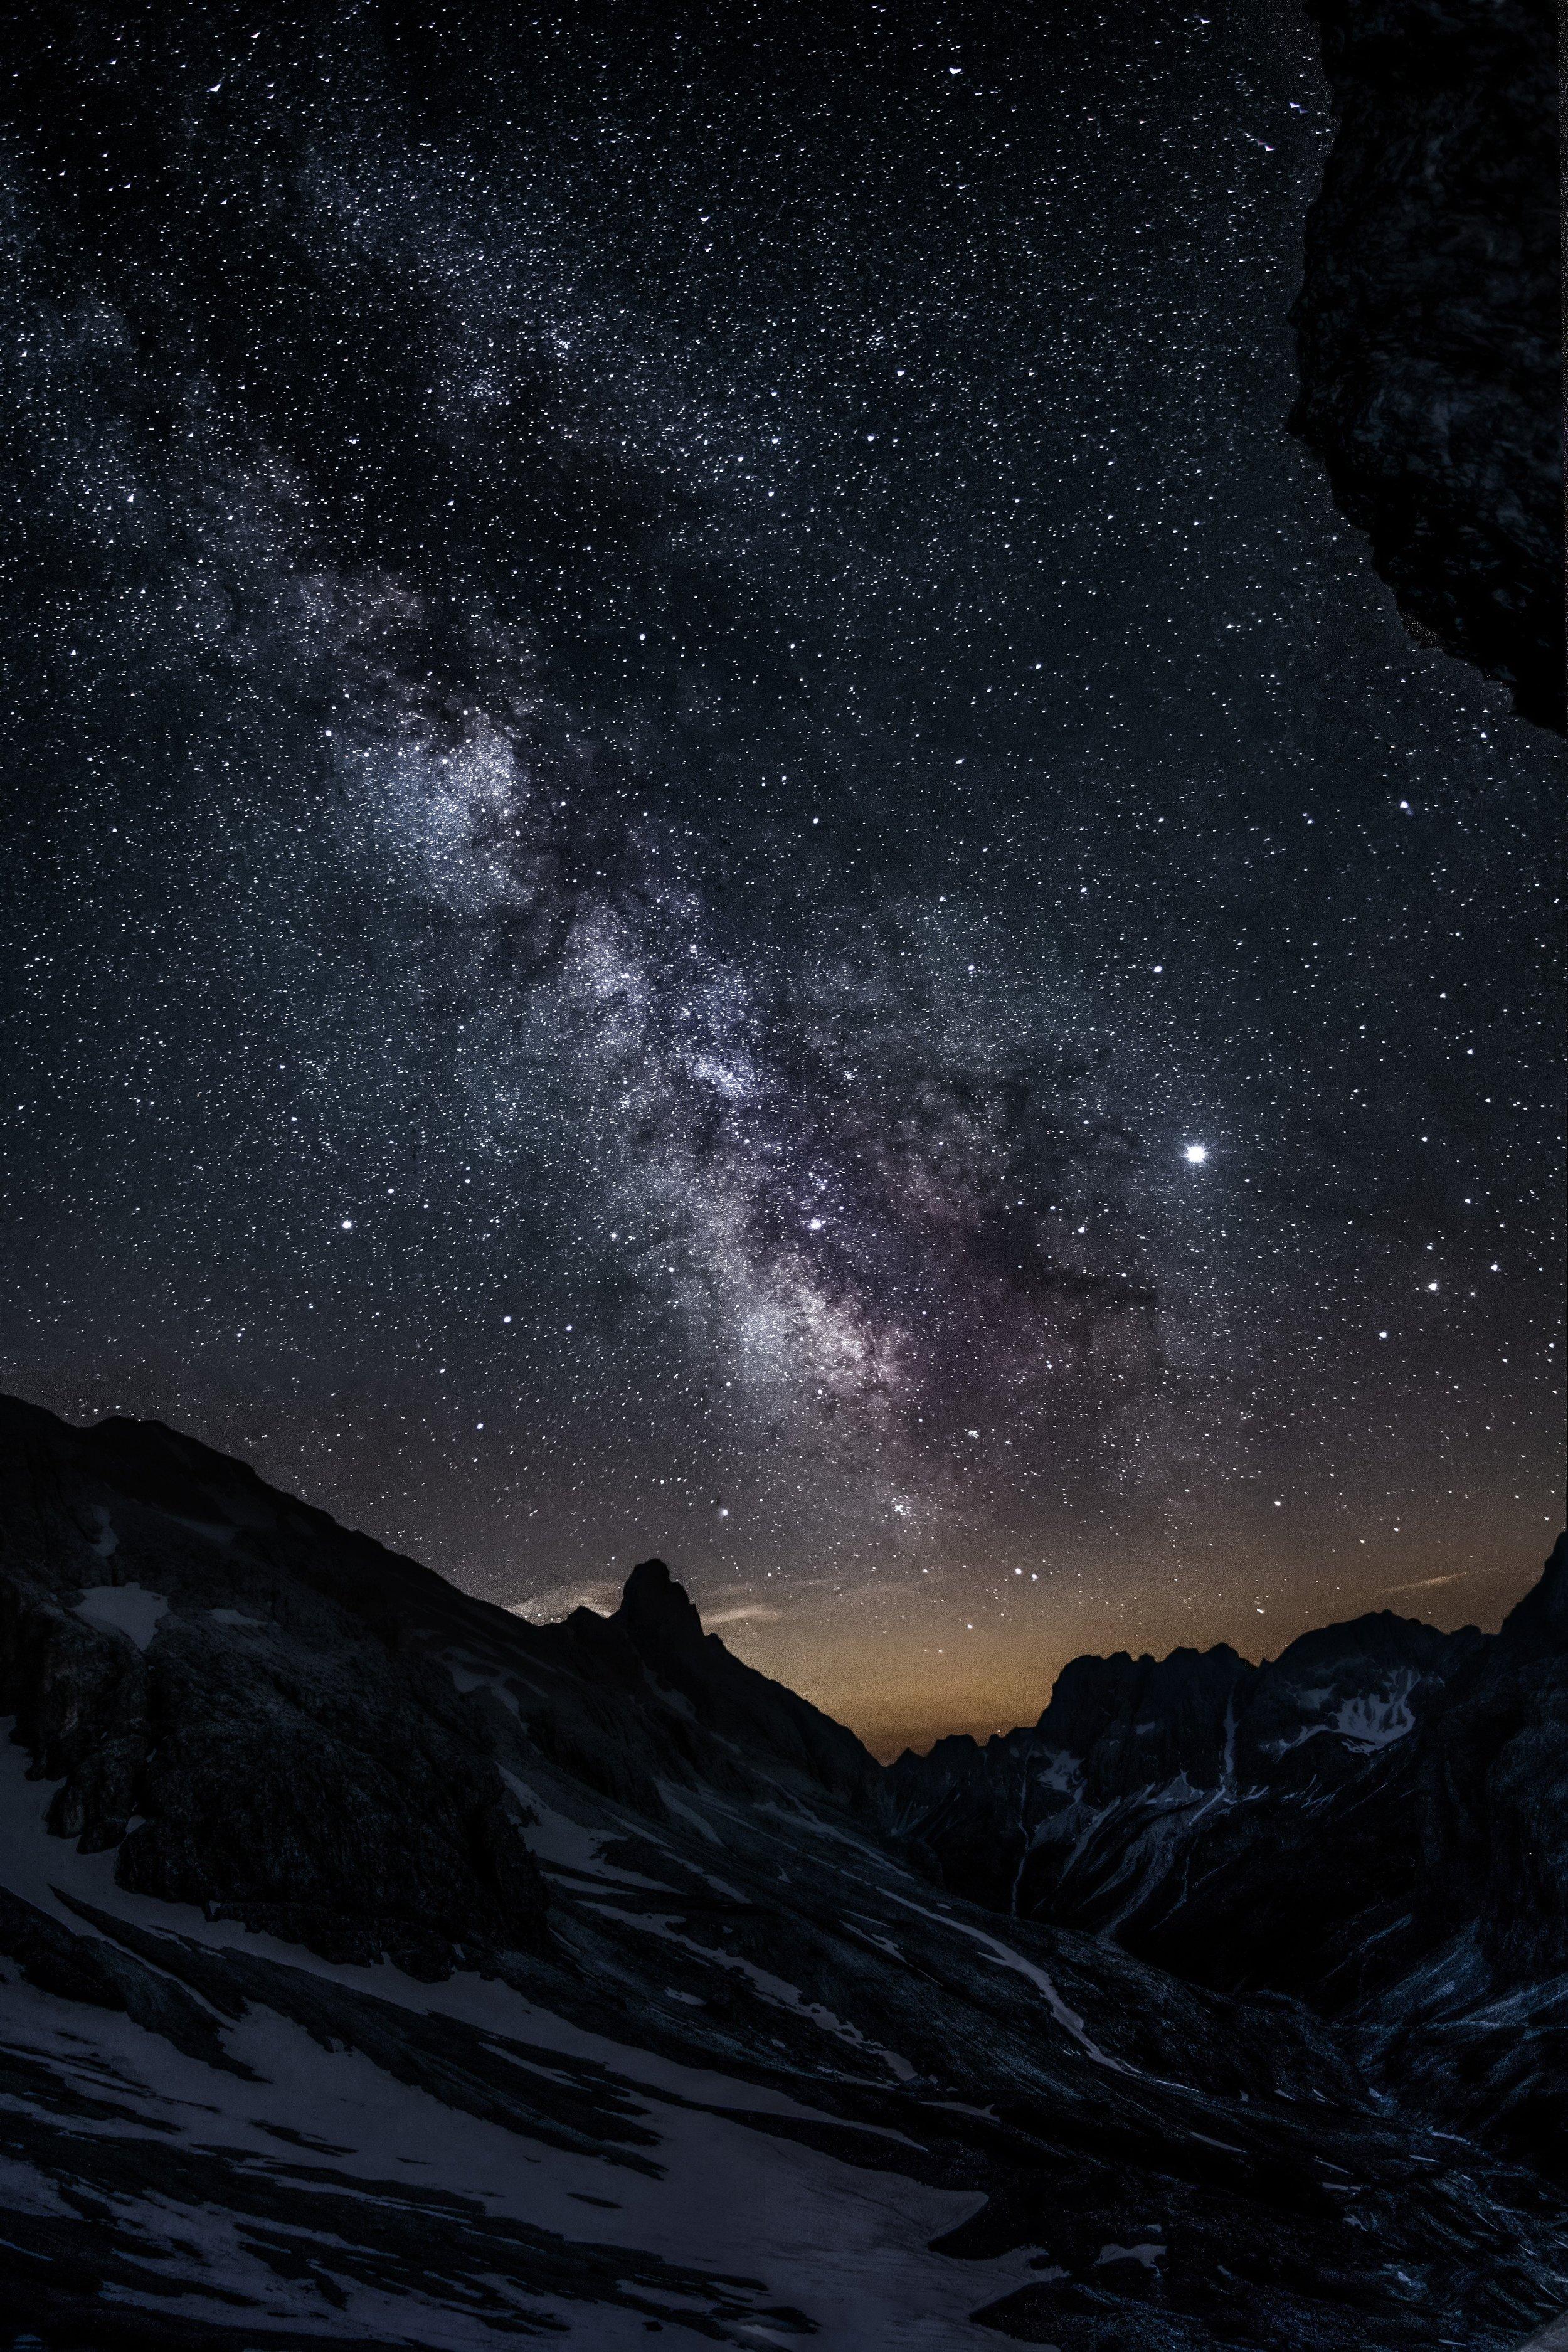 4k-wallpaper-astronomy-astrophotography-2670898.jpg